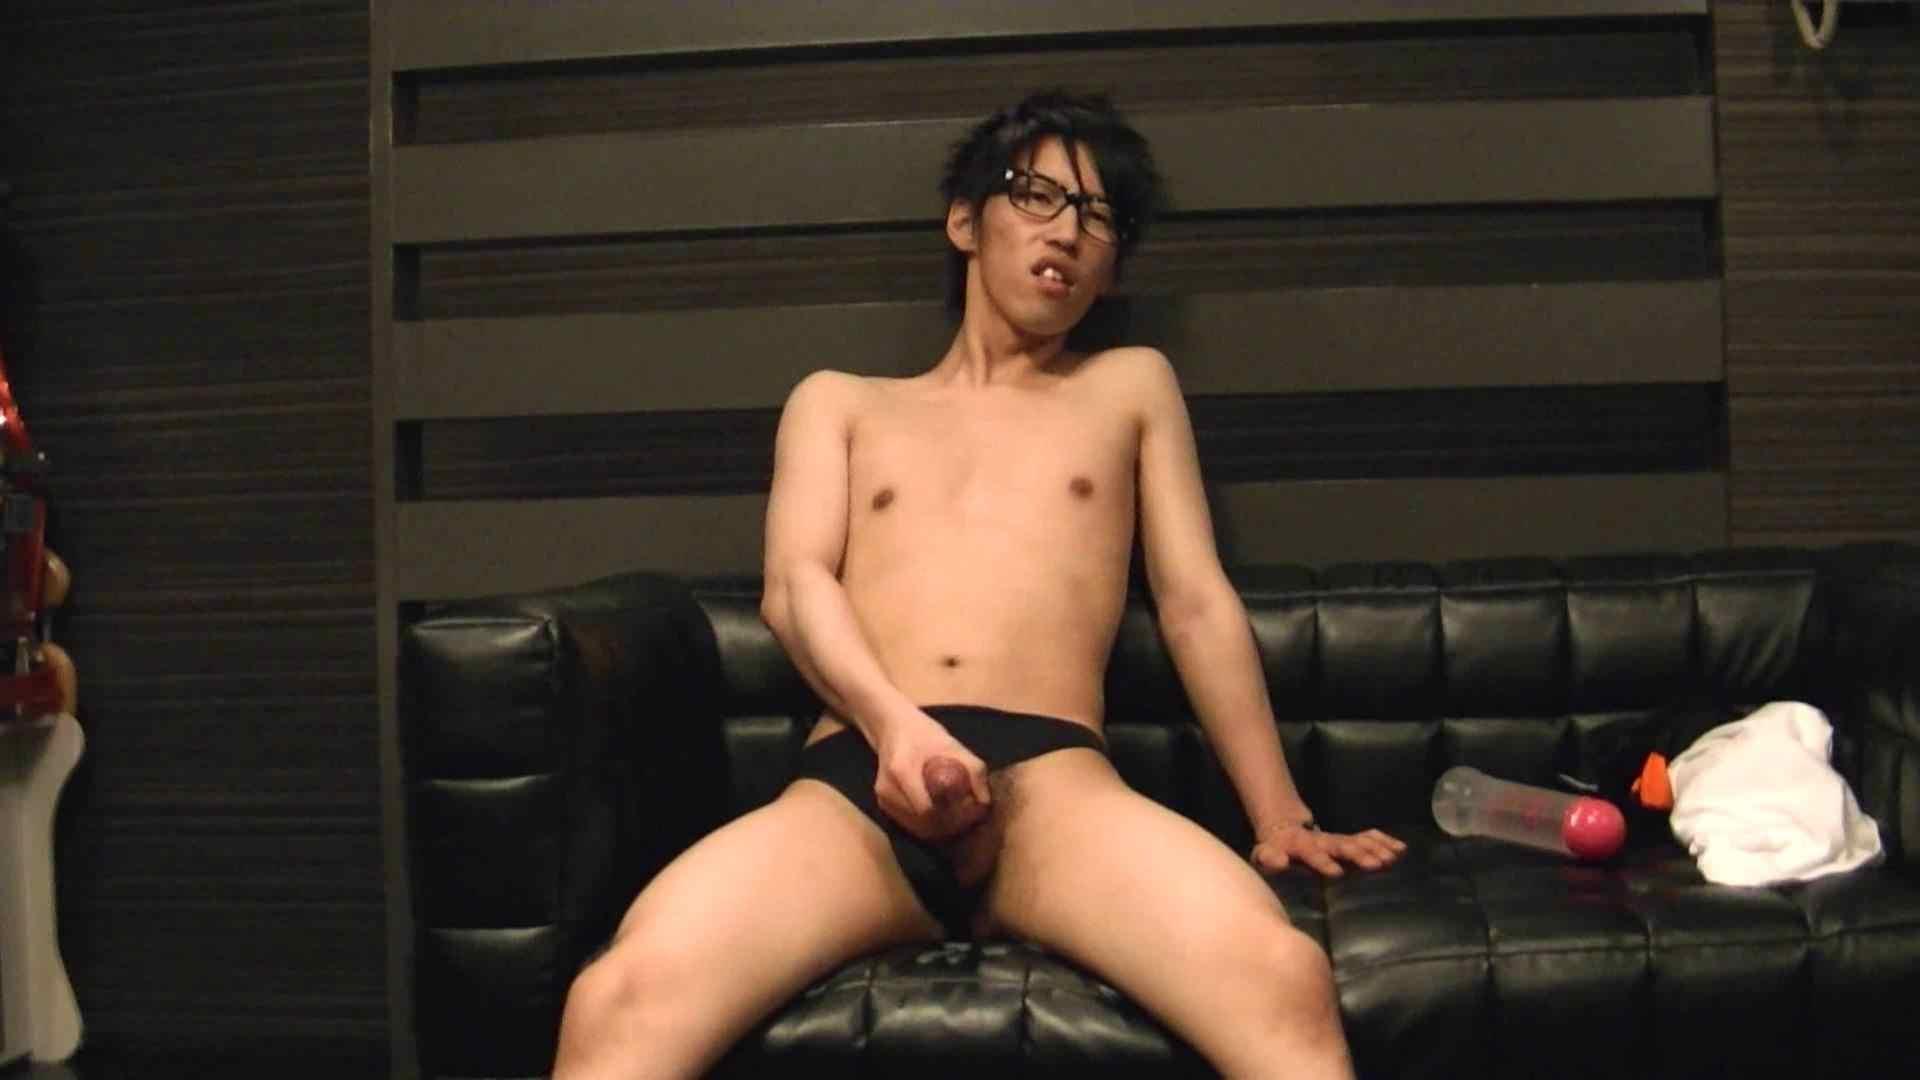 ONA見せカーニバル!! Vol3 男  93pic 20